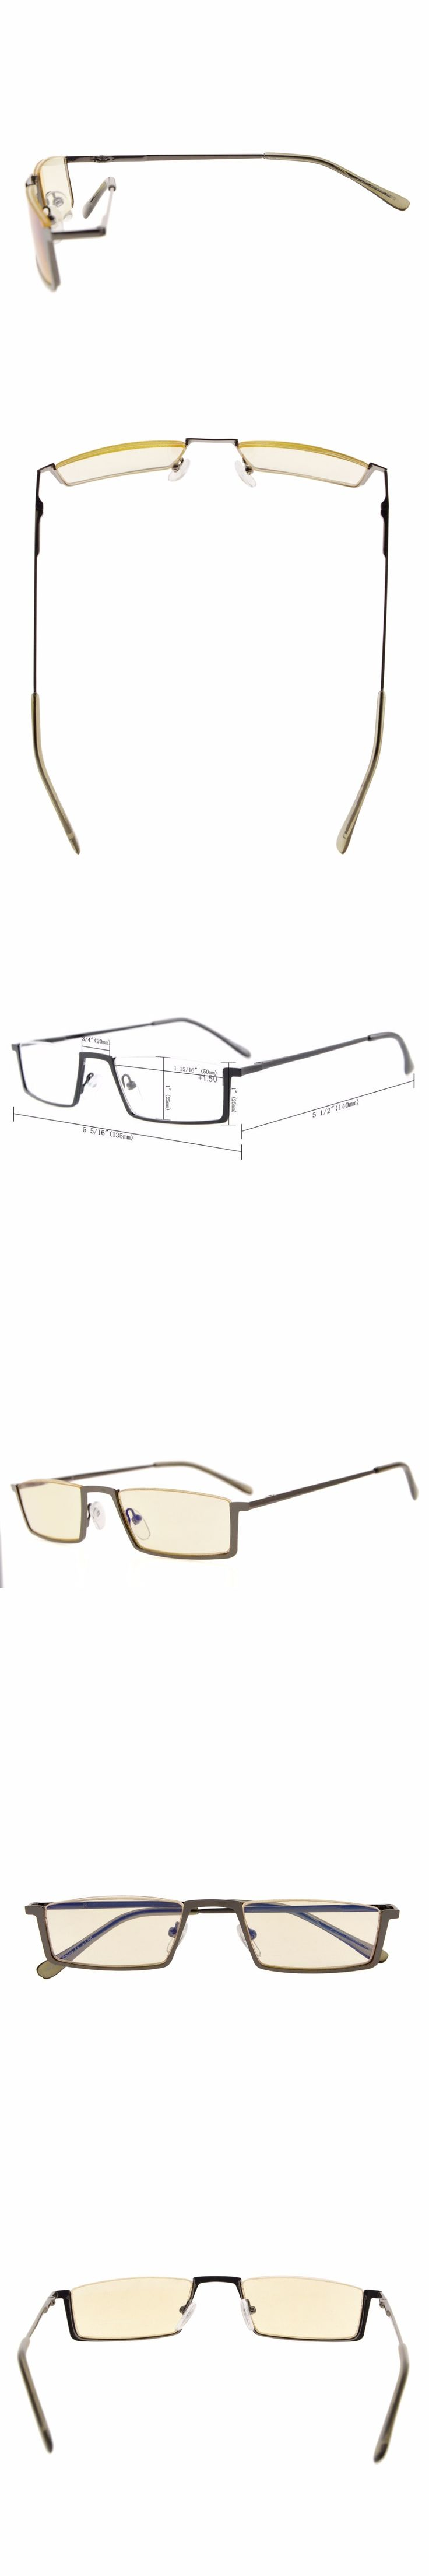 CG1613 Eyekepper Quality Spring Hinges Half-Rim Computer Readers Reading Glasses Eyeglasses